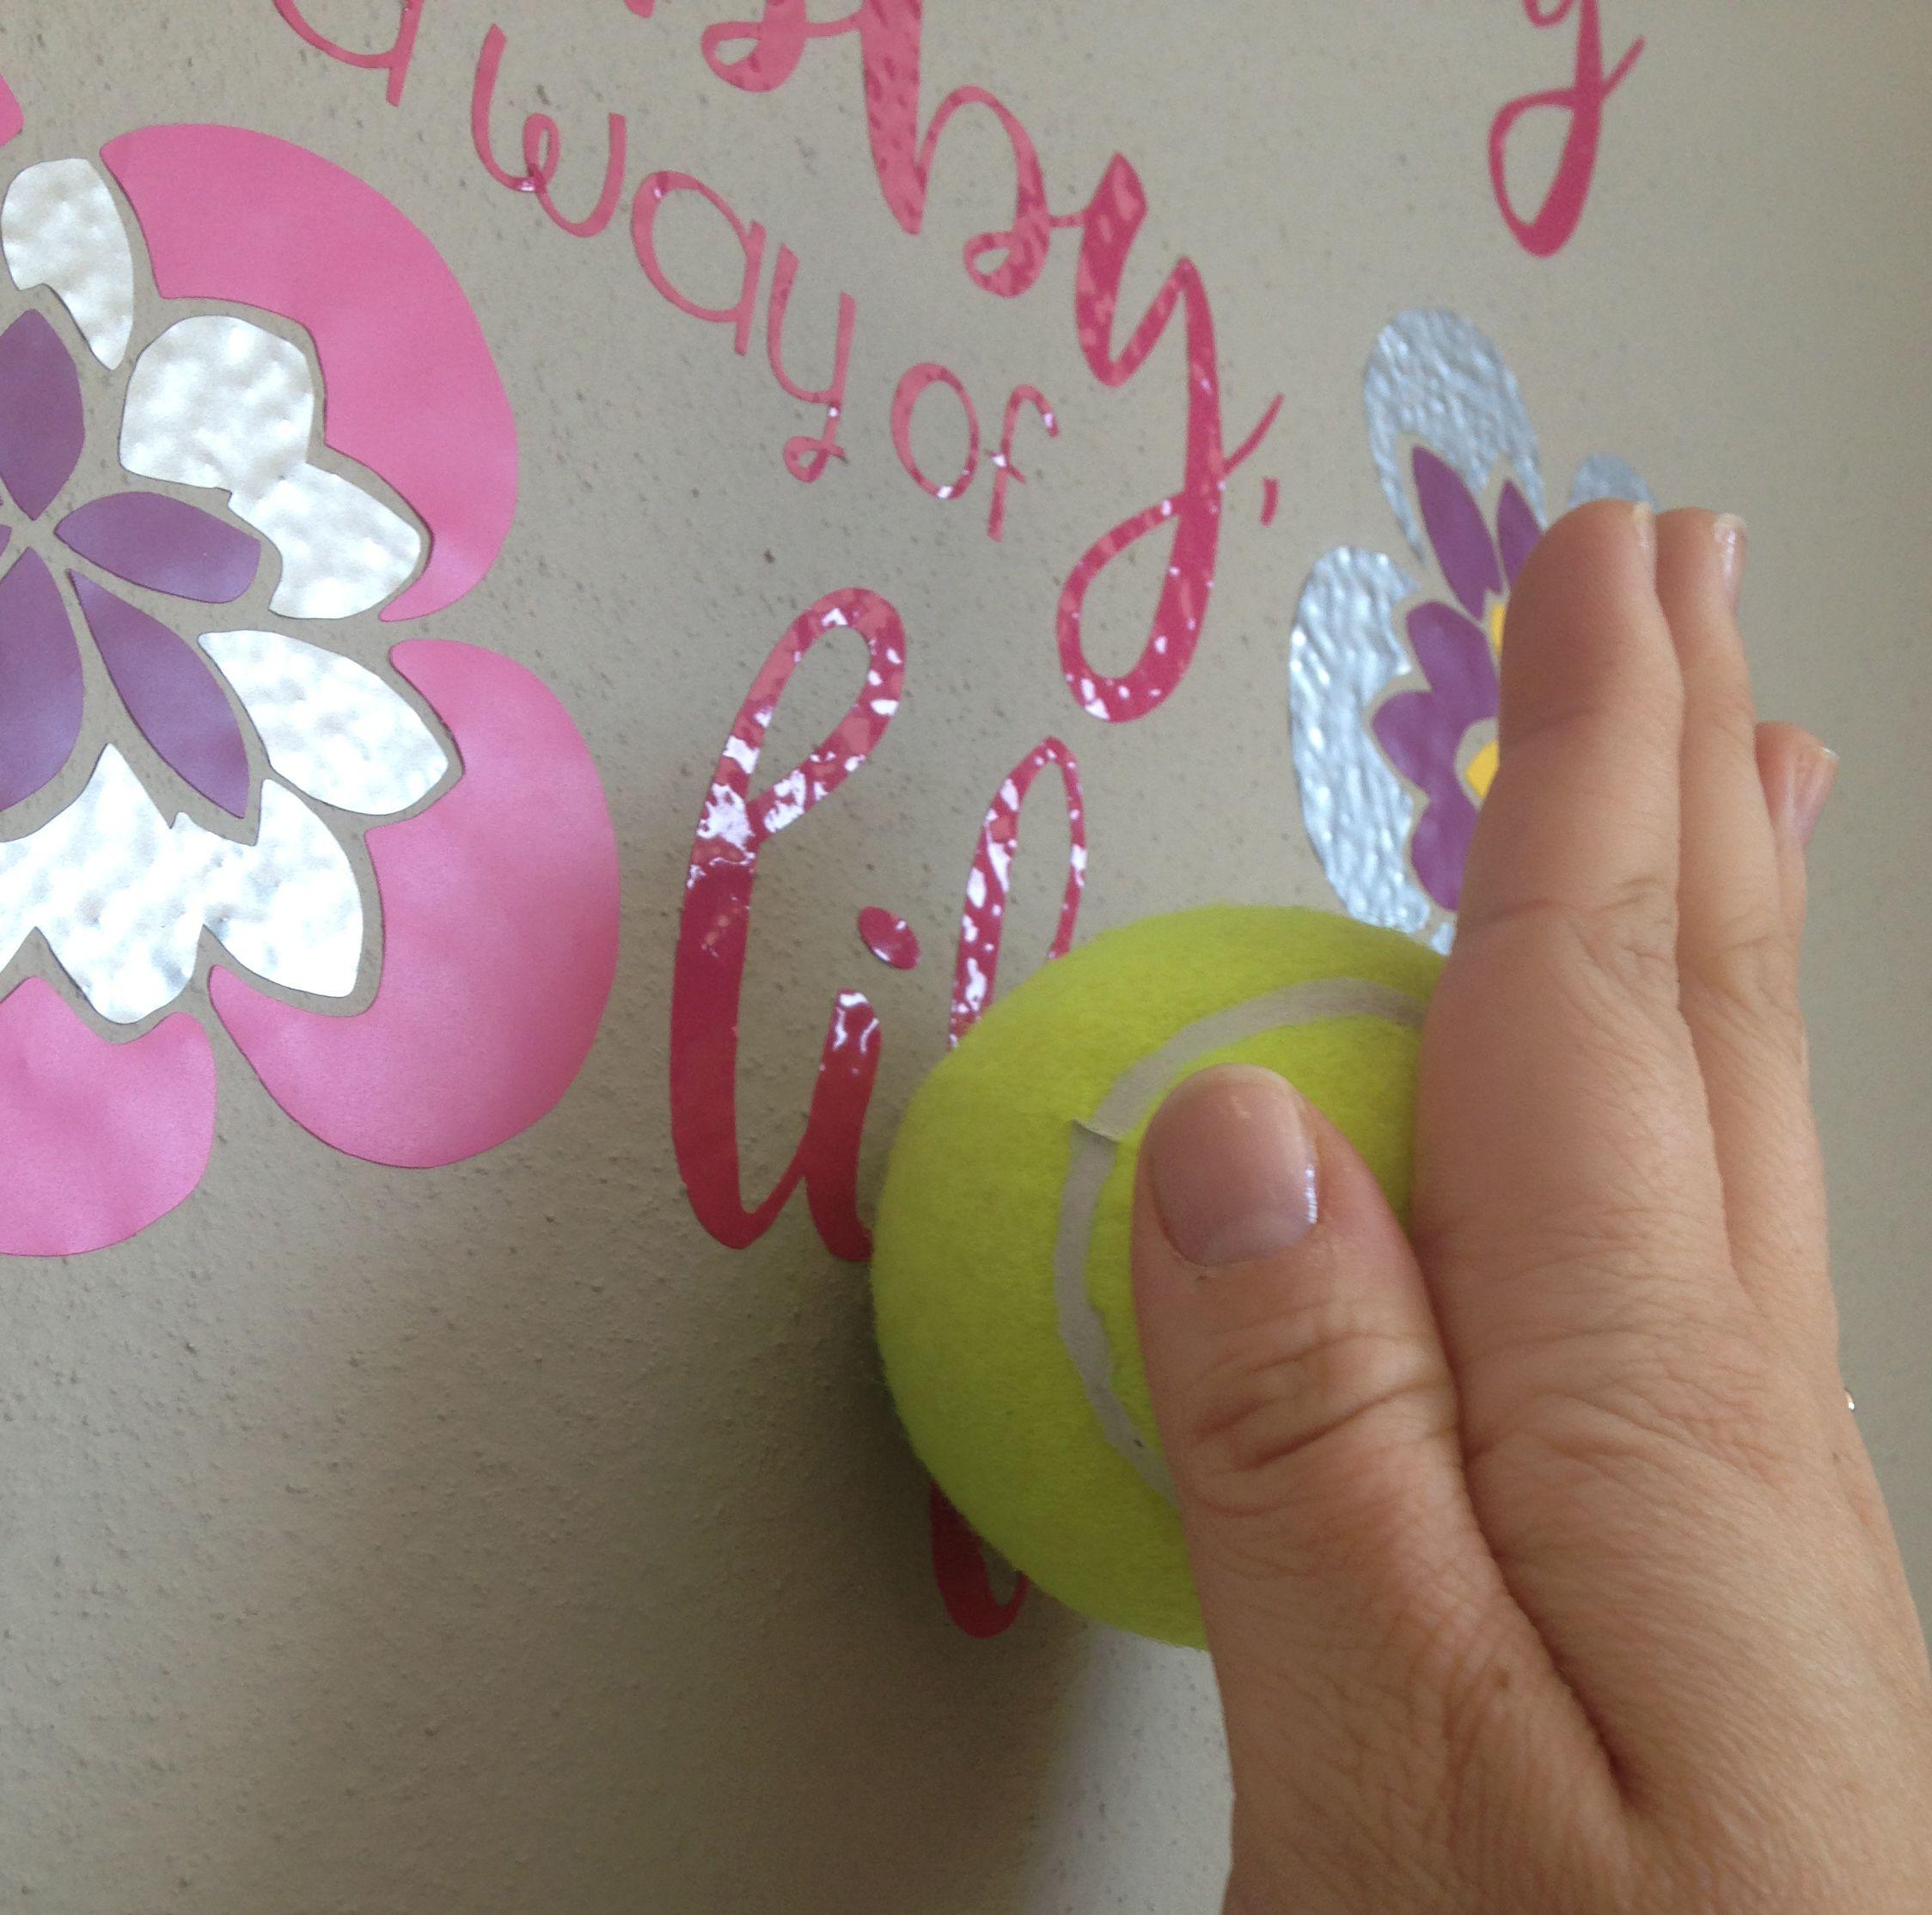 Use A Tennis Ball To Get Vinyl To Stick To Textured Walls Smart Whydidntithinkofthat Cricut Creations Cricut Crafts Vinyl Crafts